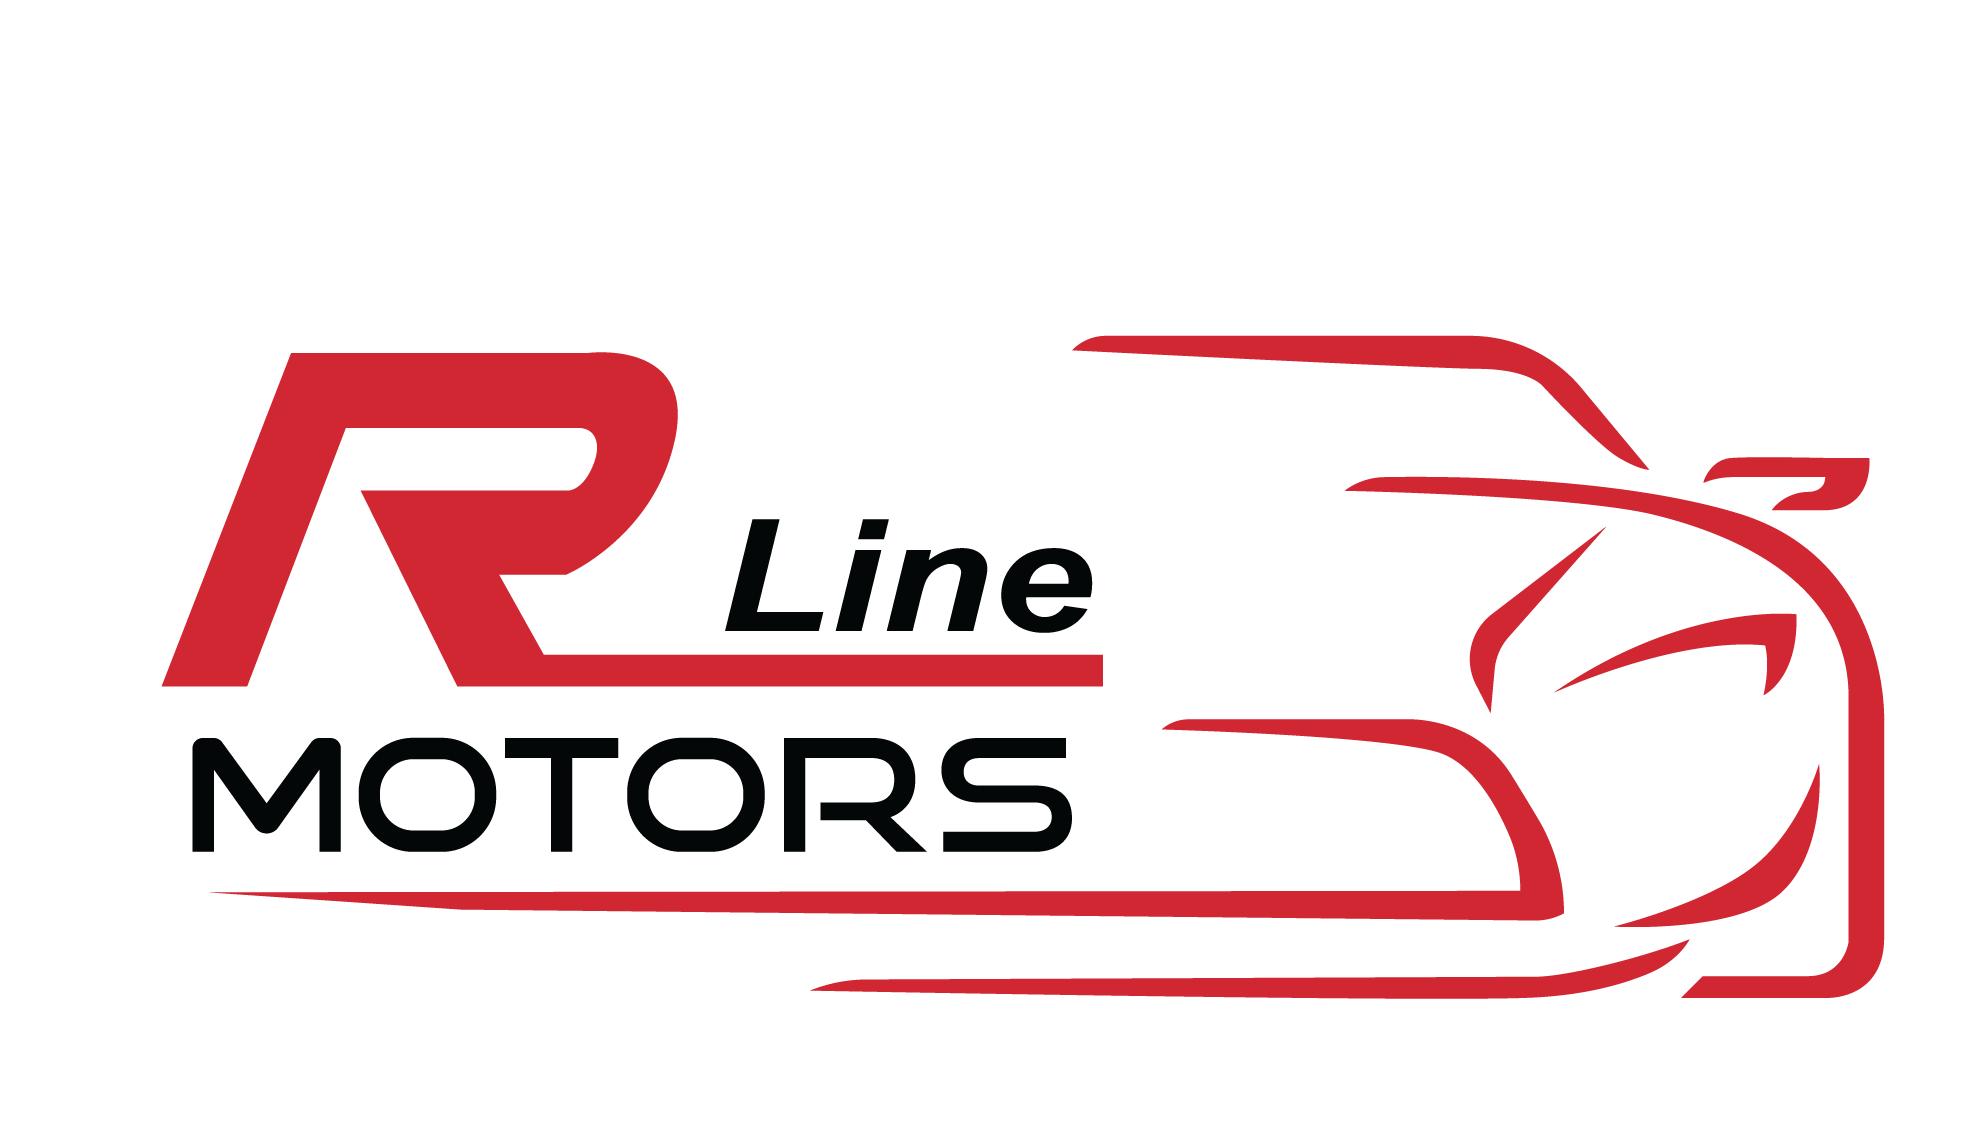 R Line Motors